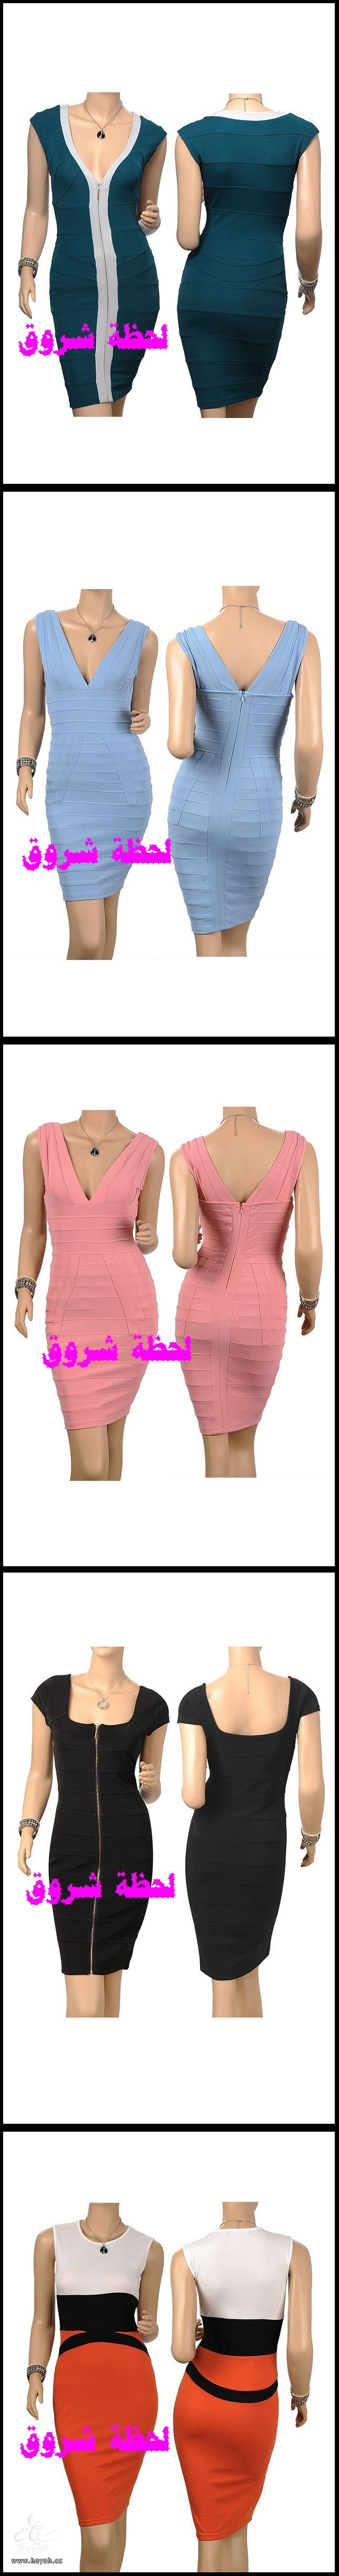 Dresses2015  2 hayahcc_1435965286_558.jpg